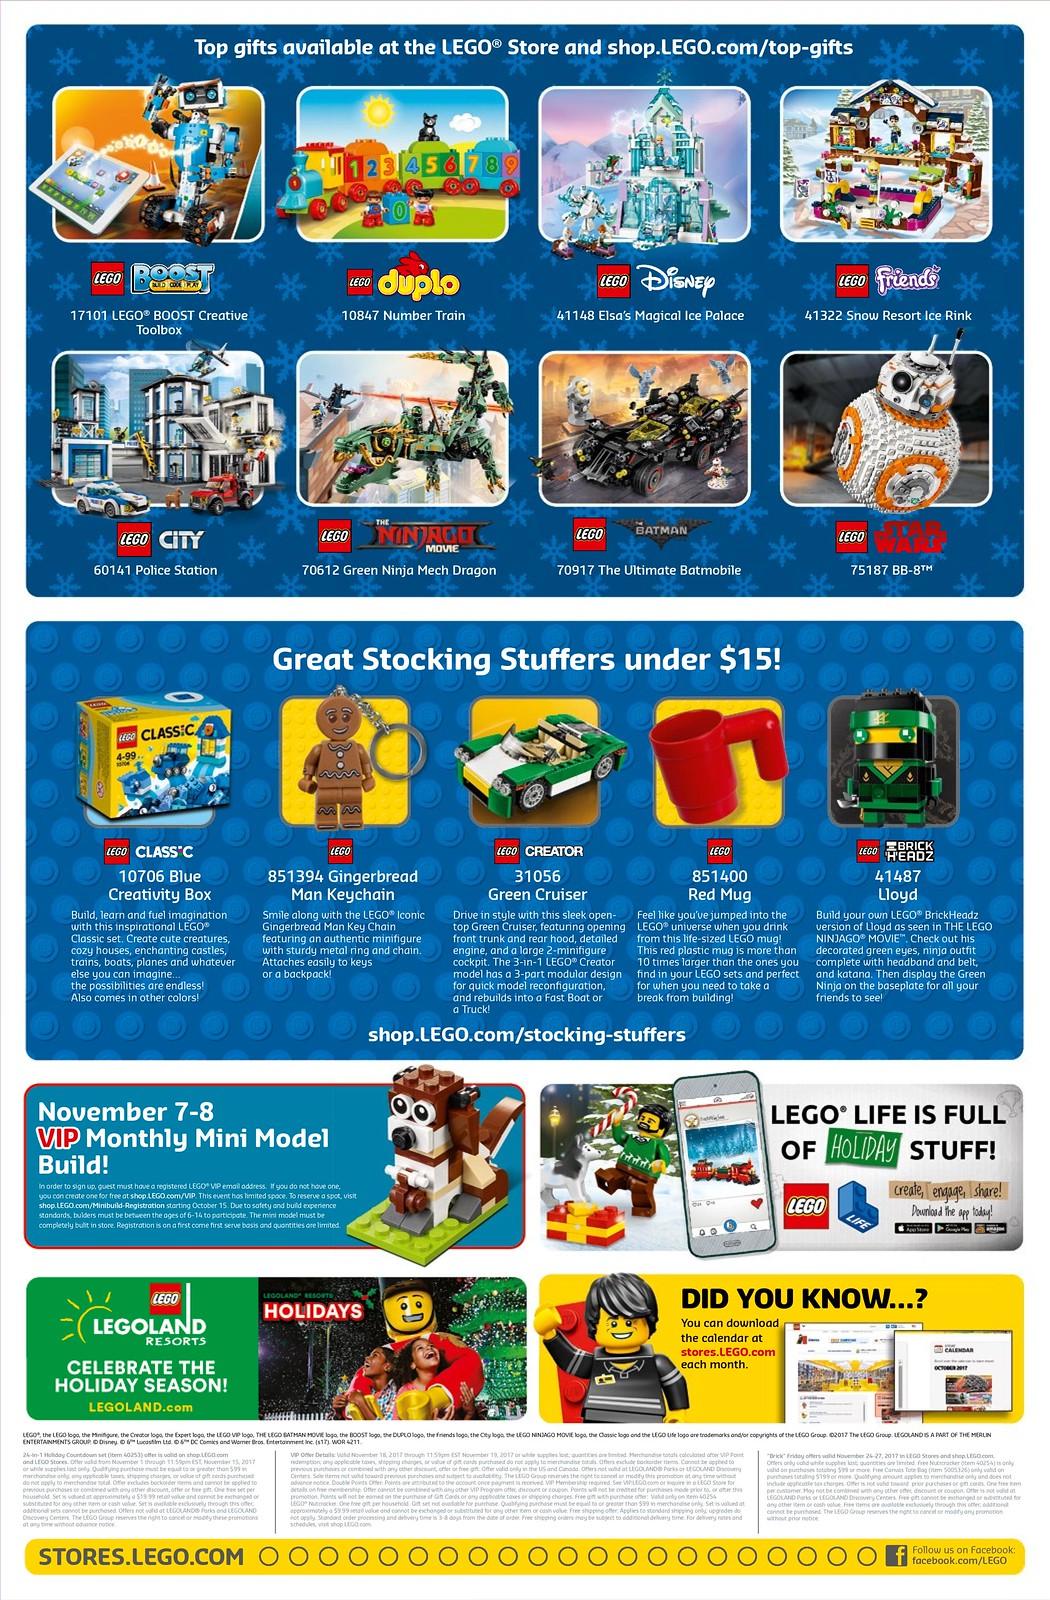 LEGO Brand Store Calendar November Promotions